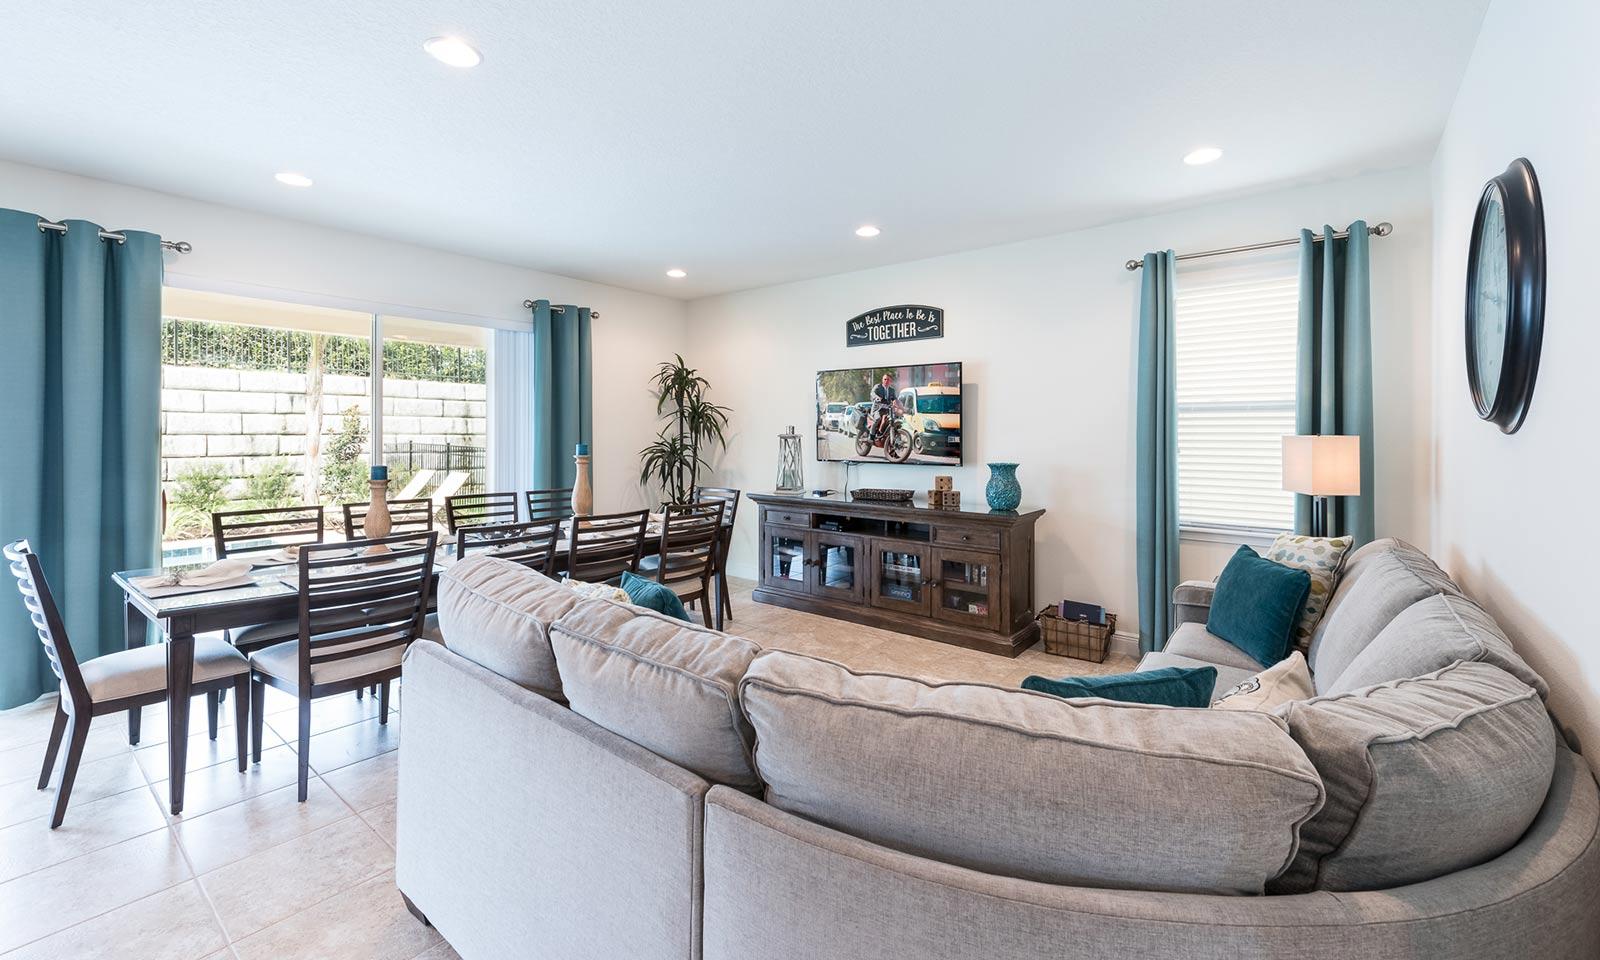 [amenities:living-area:2] Living Area